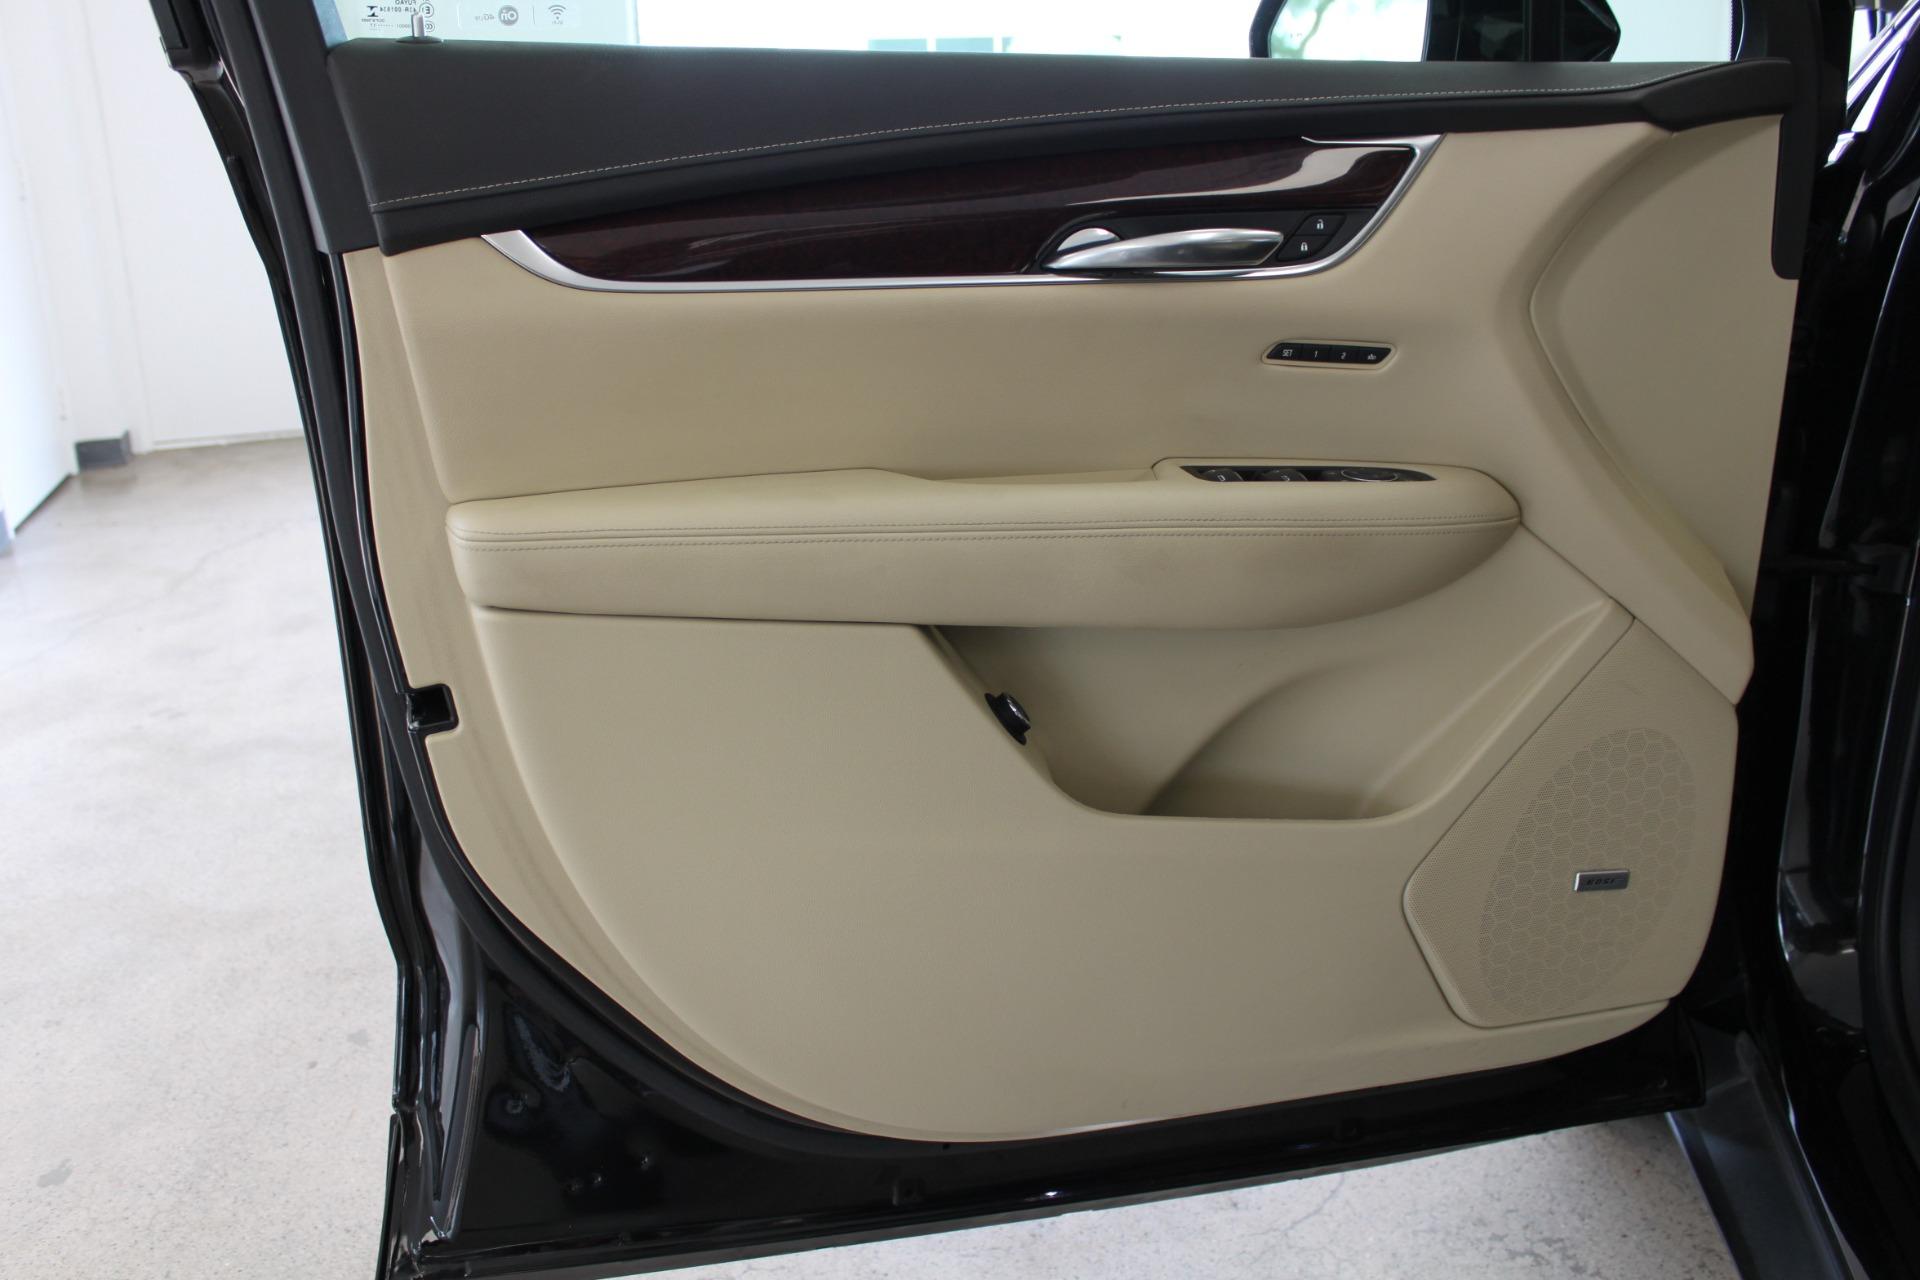 Used-2017-Cadillac-XT5-Luxury-All-Wheel-Drive-Luxury-AWD-Land-Rover